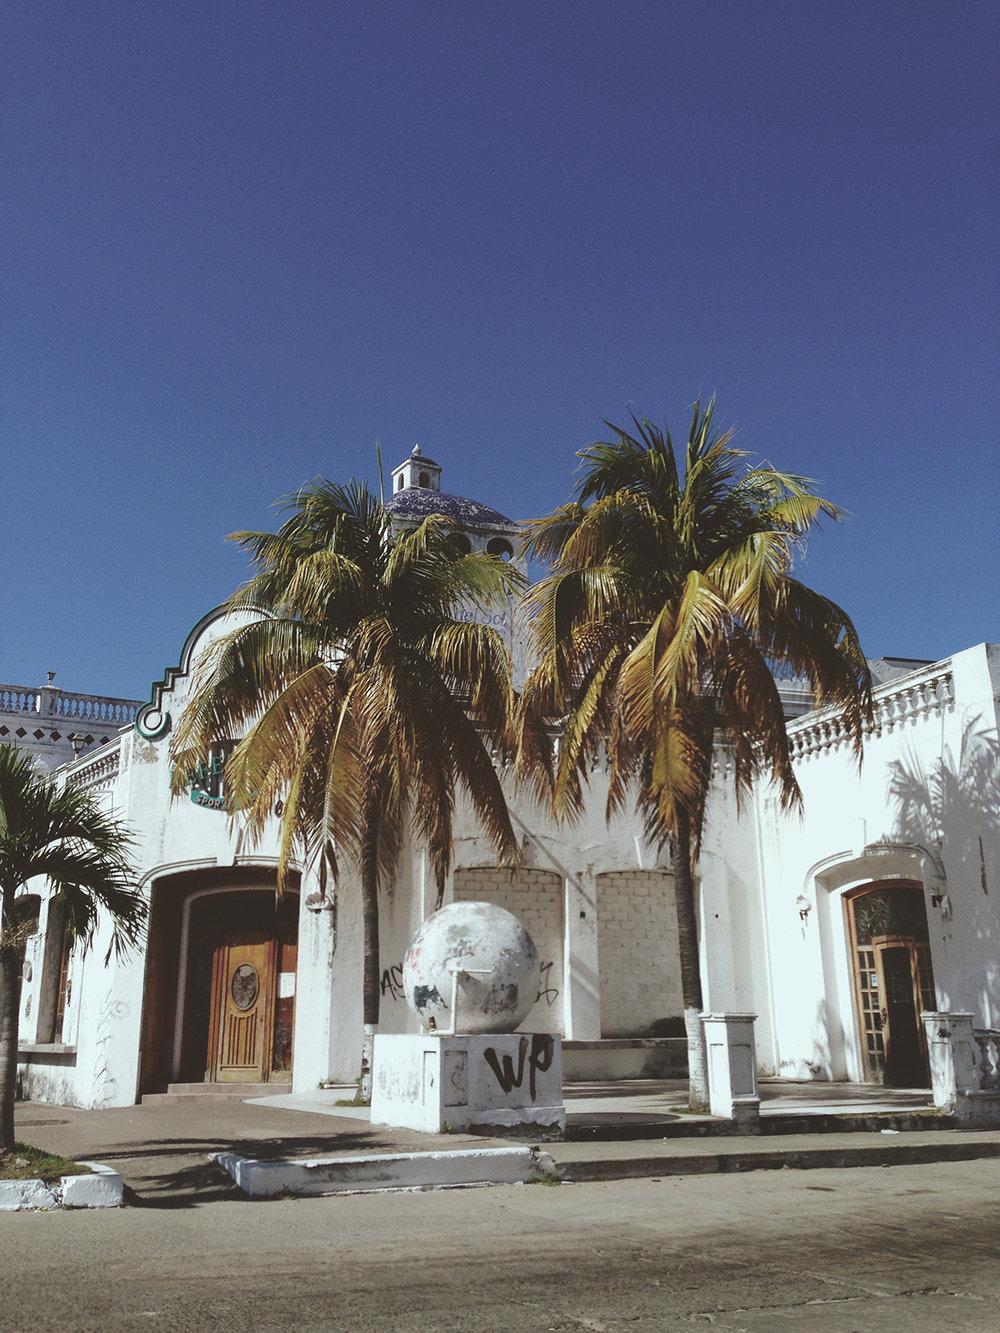 Bea Rue Professional Freelance Wedding Event Travel Photographer Puerto Vallarta Mexico Architecture.jpg